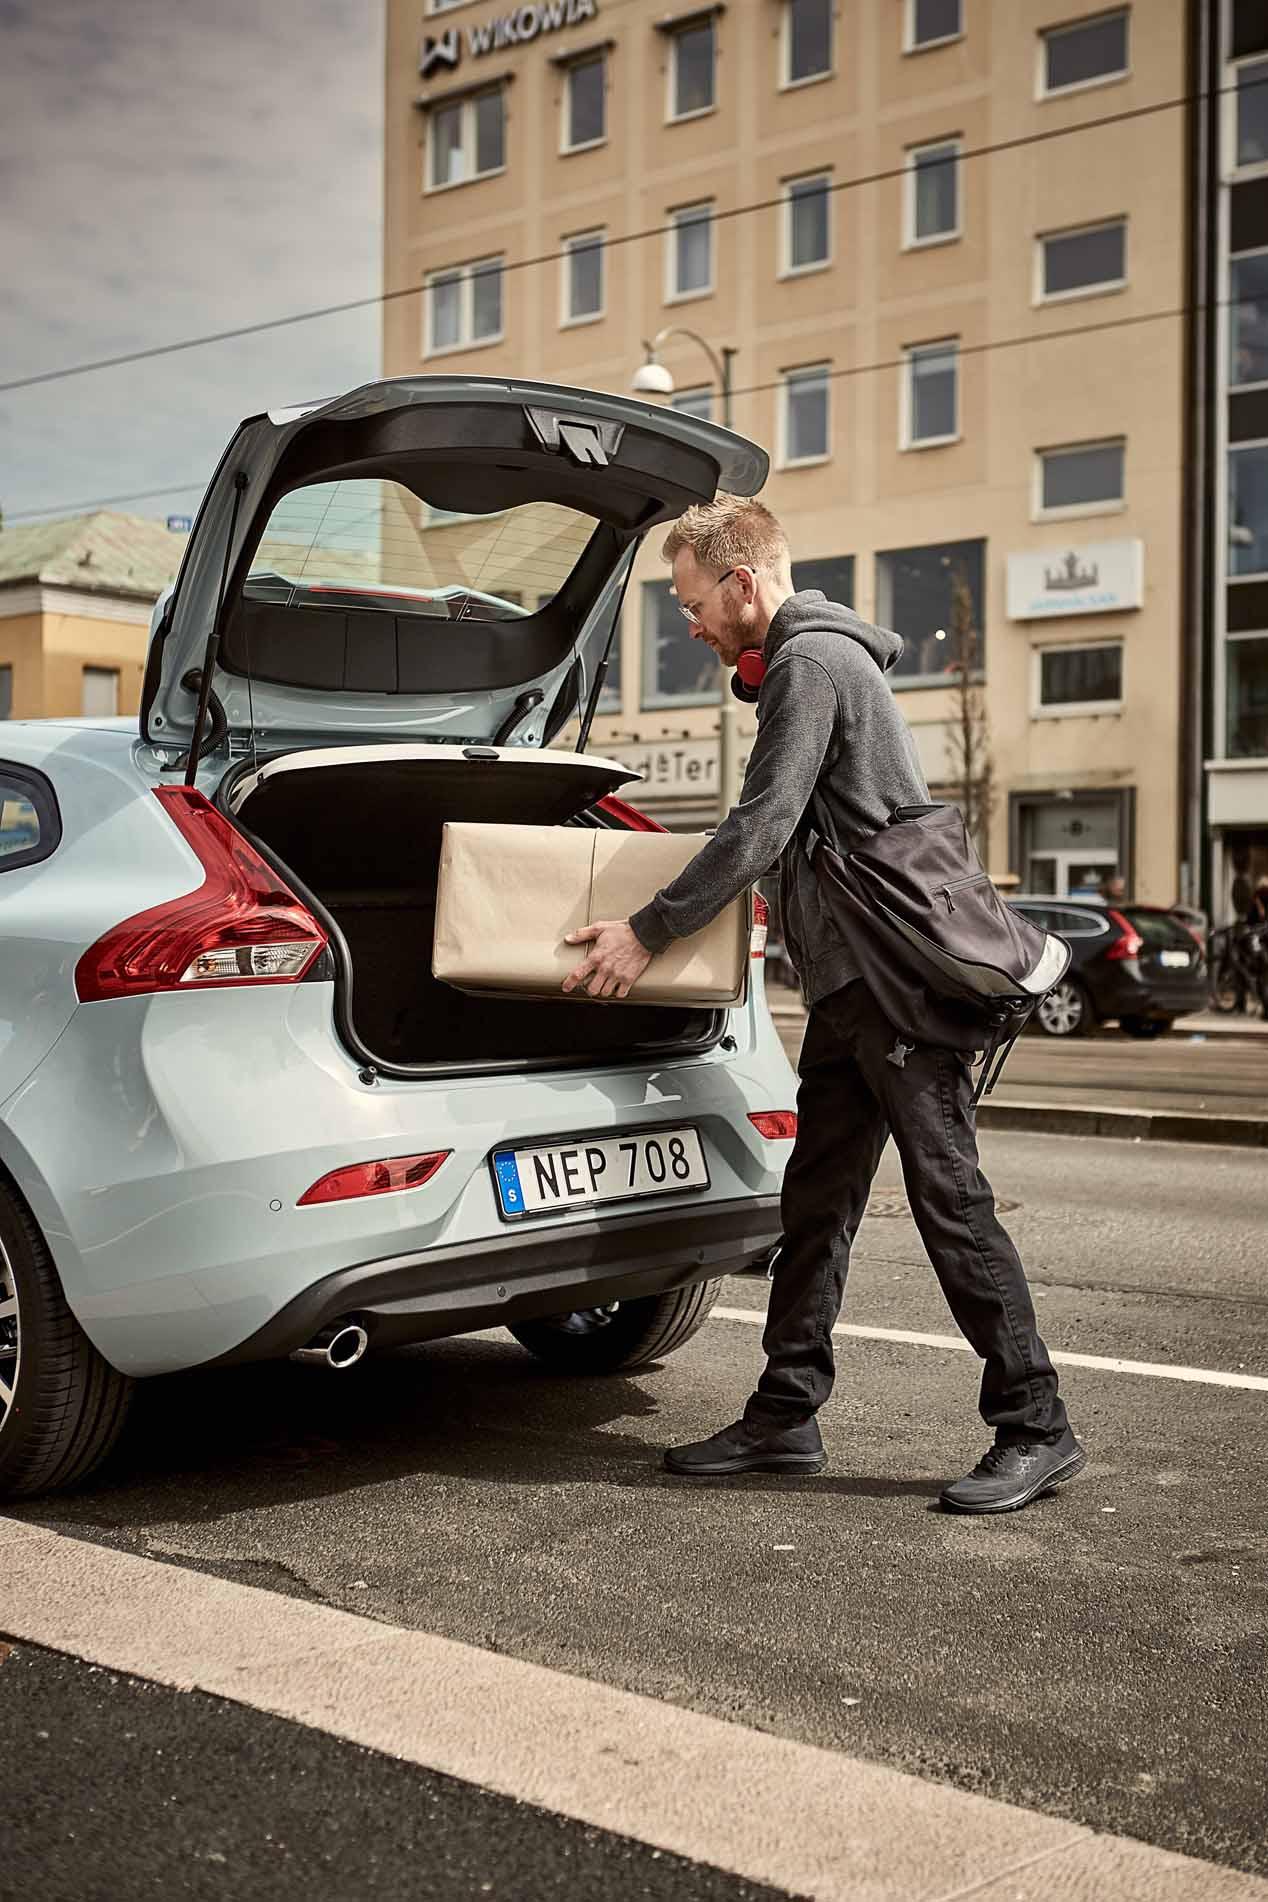 Los fabricantes de coches abren tu maletero para recoger pedidos